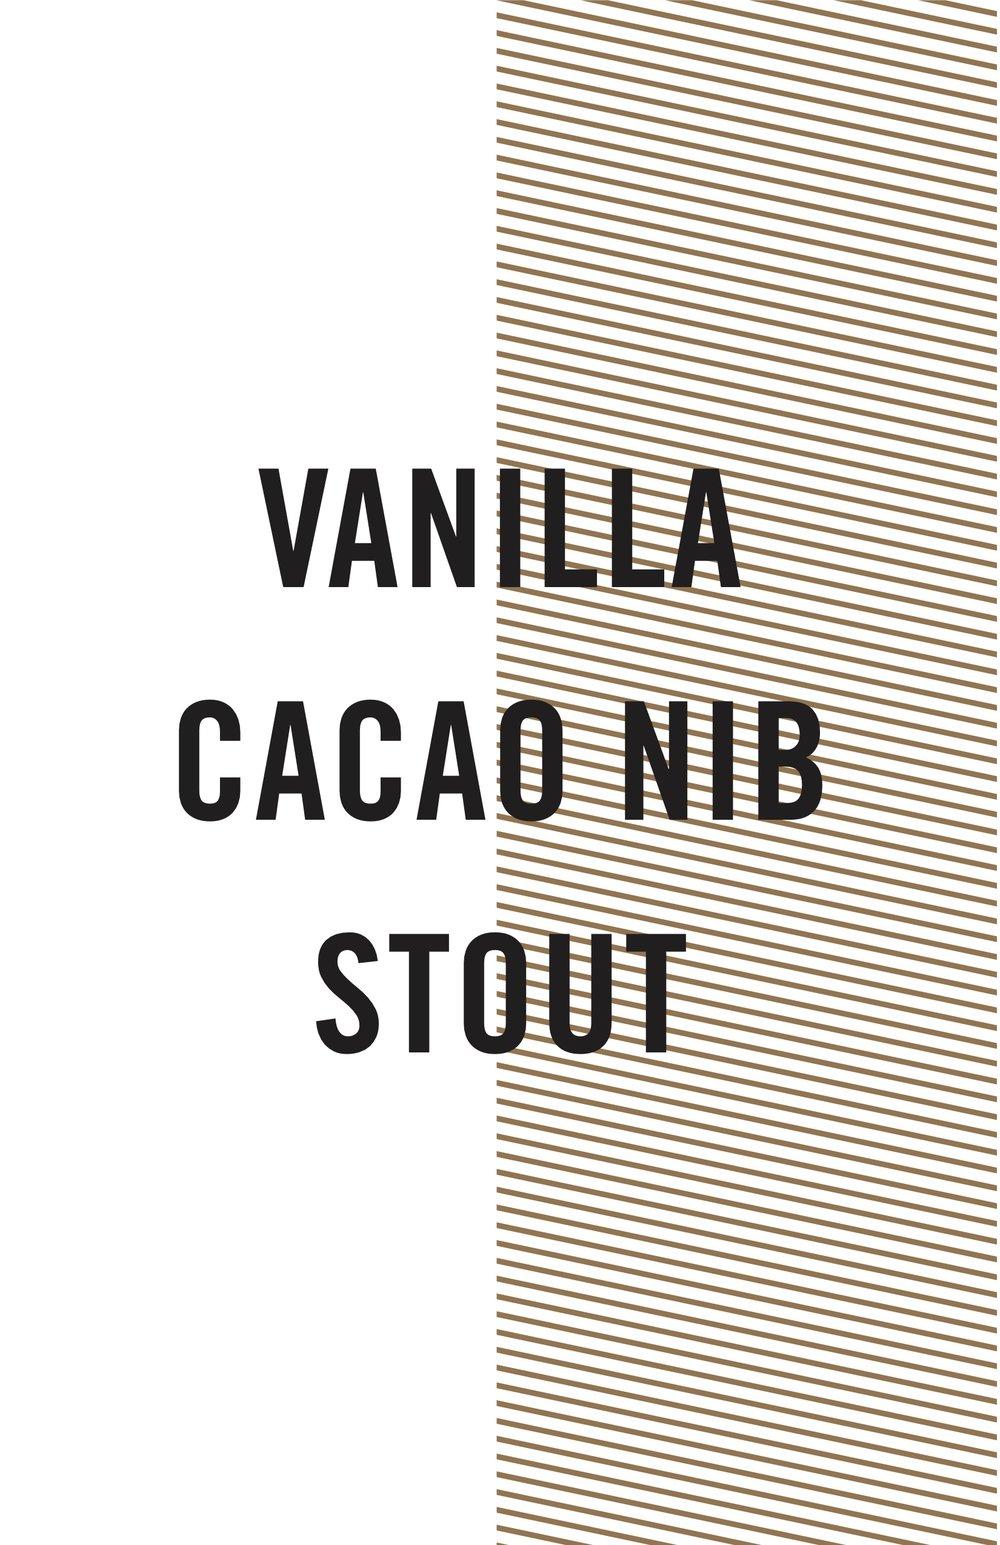 VANILLA CACAO NIB STOUT.jpg